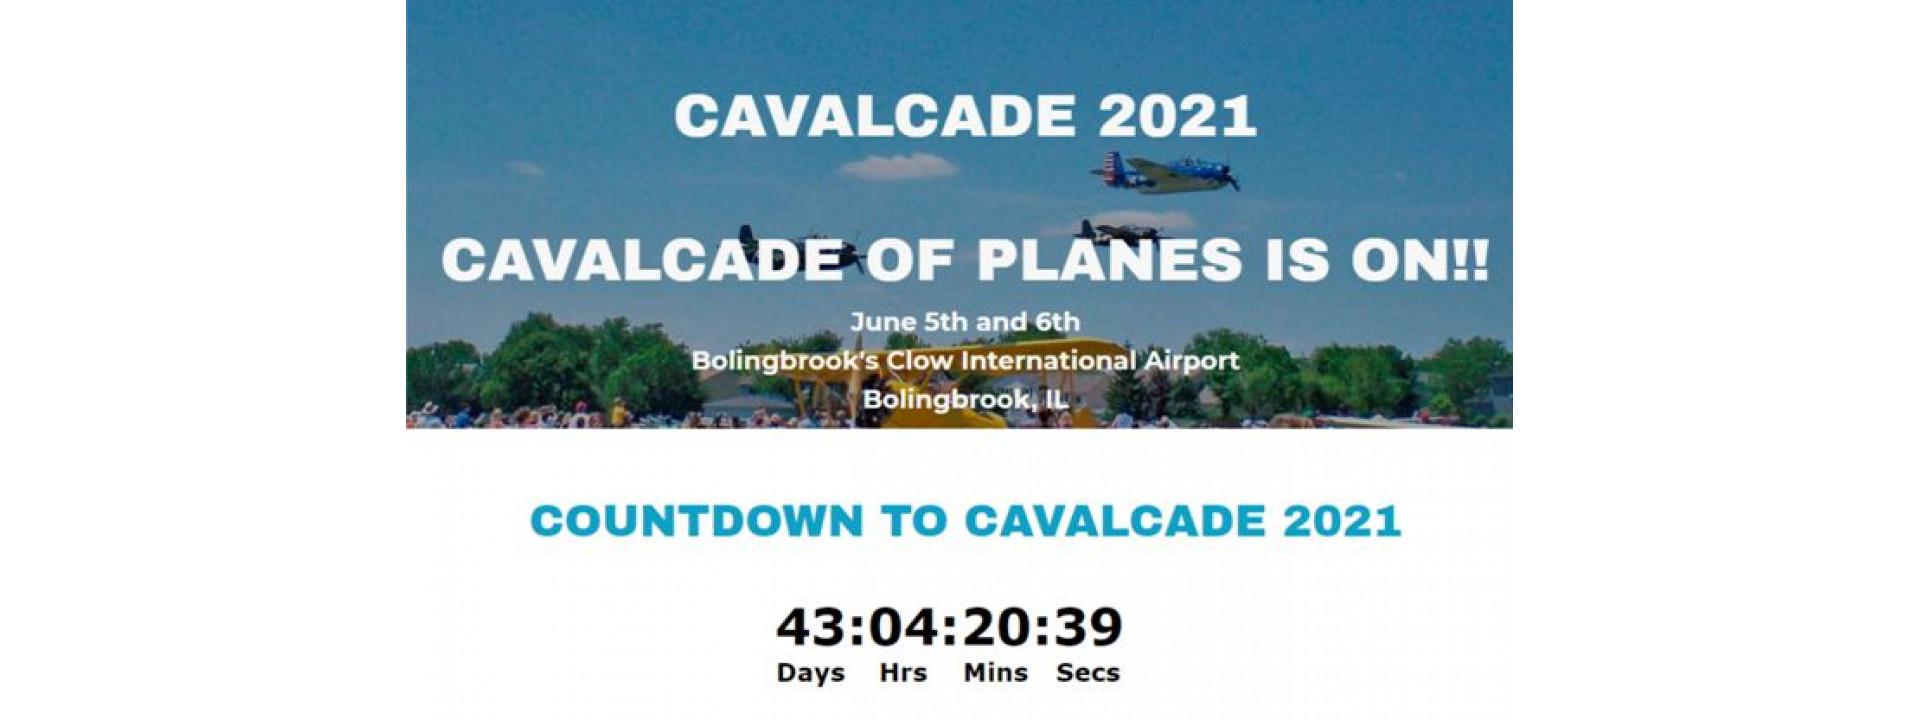 Cavalrade 2021